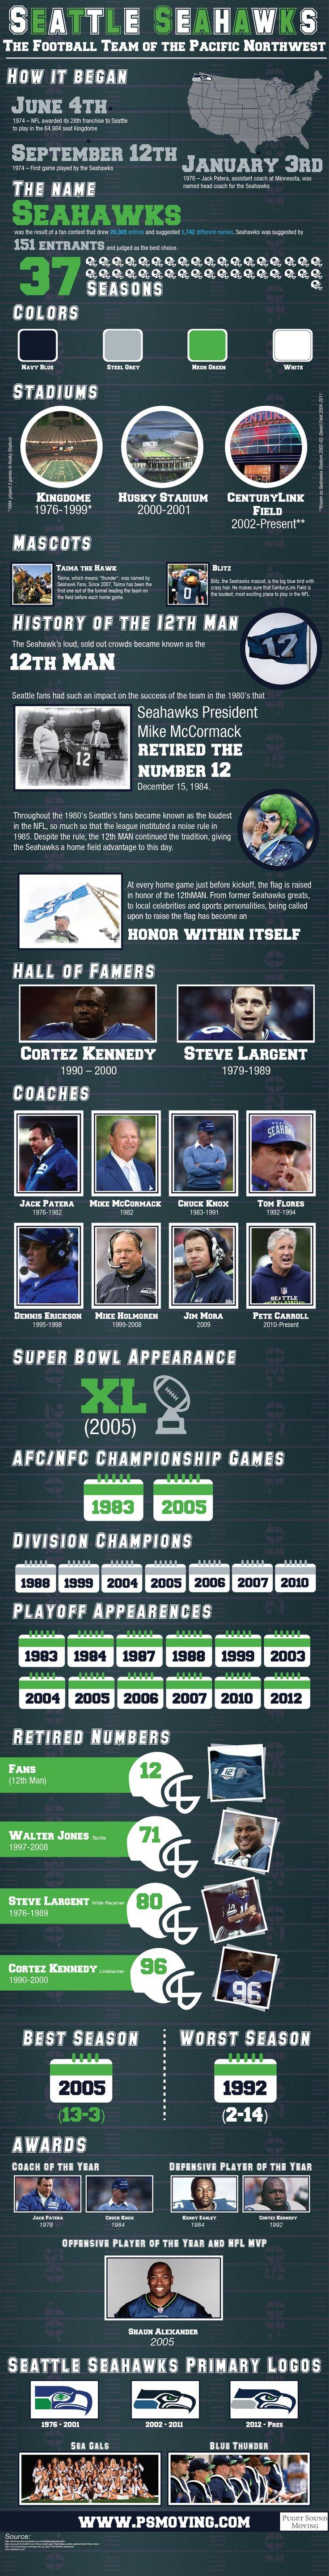 Seahawks stats!